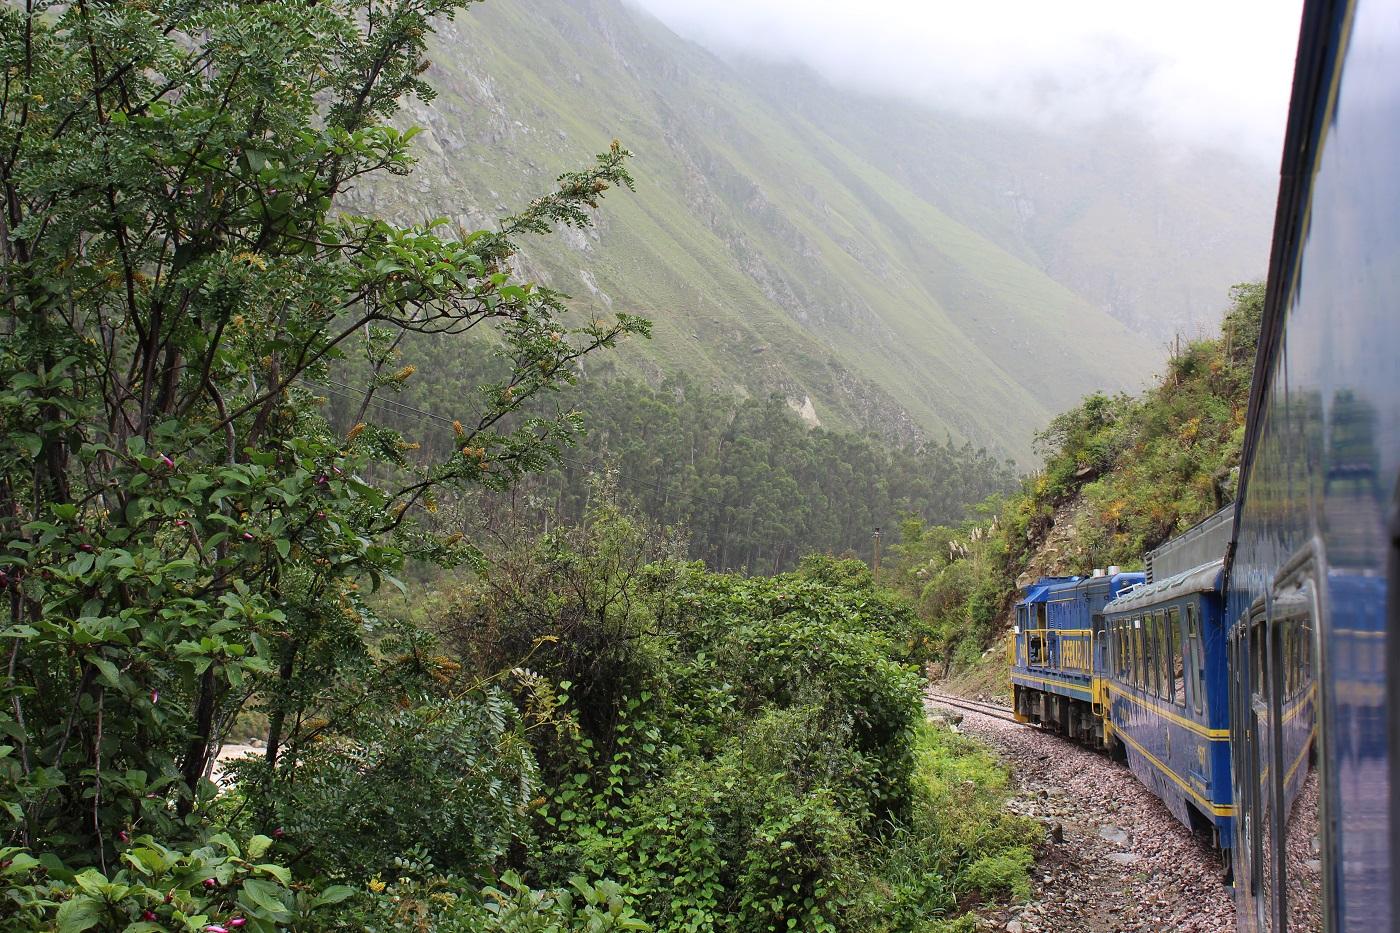 Trem para Águas Calientes (Foto: Tati Sisti)